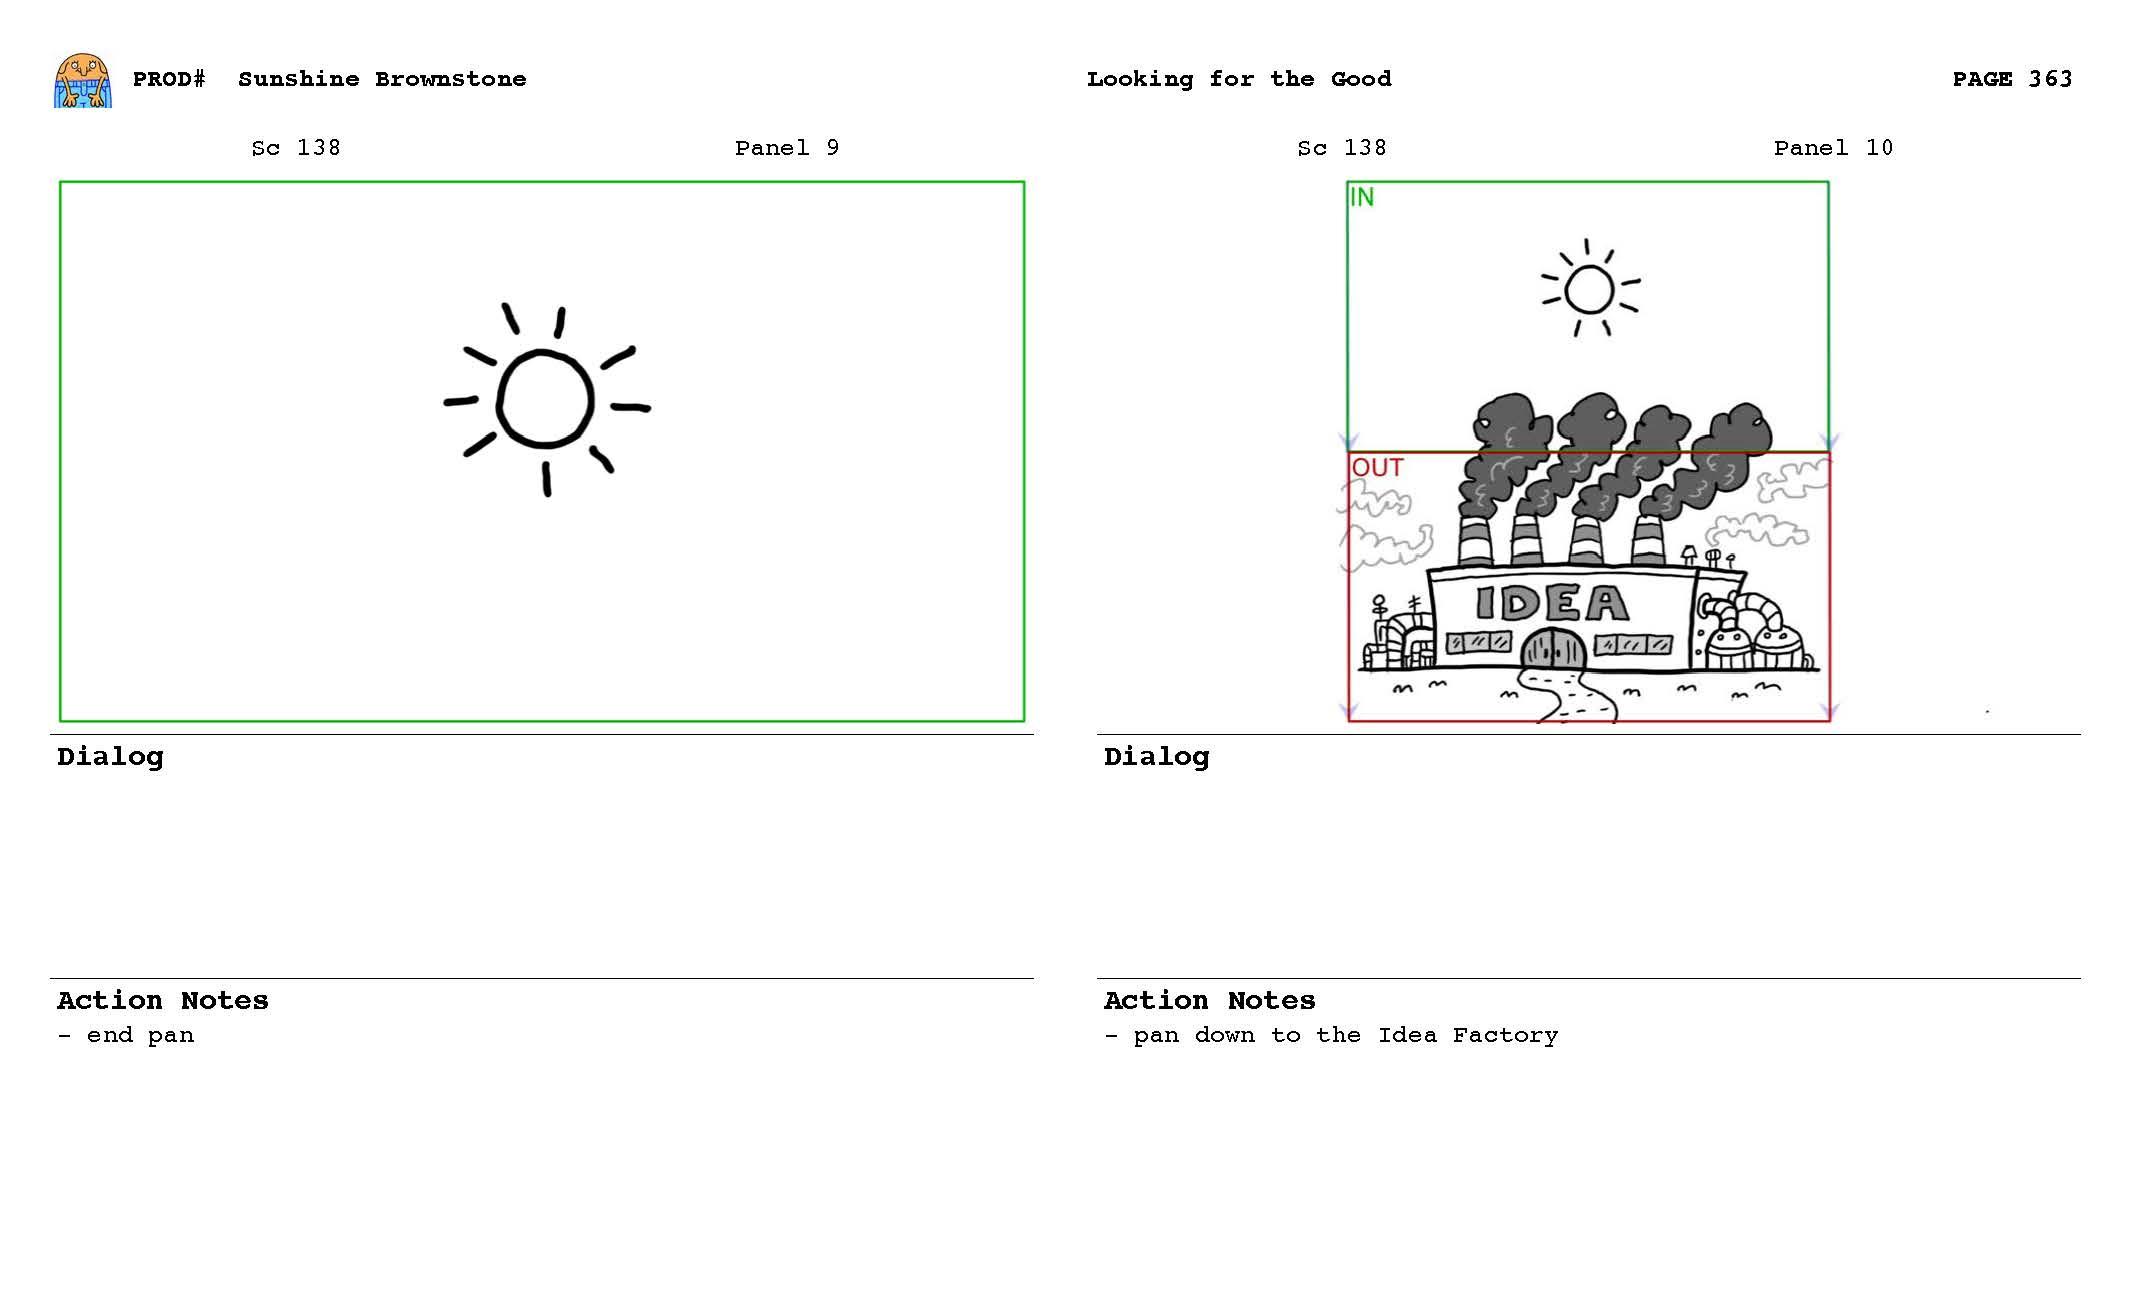 SunshineBrownstone_Dev1_Page_363.jpg